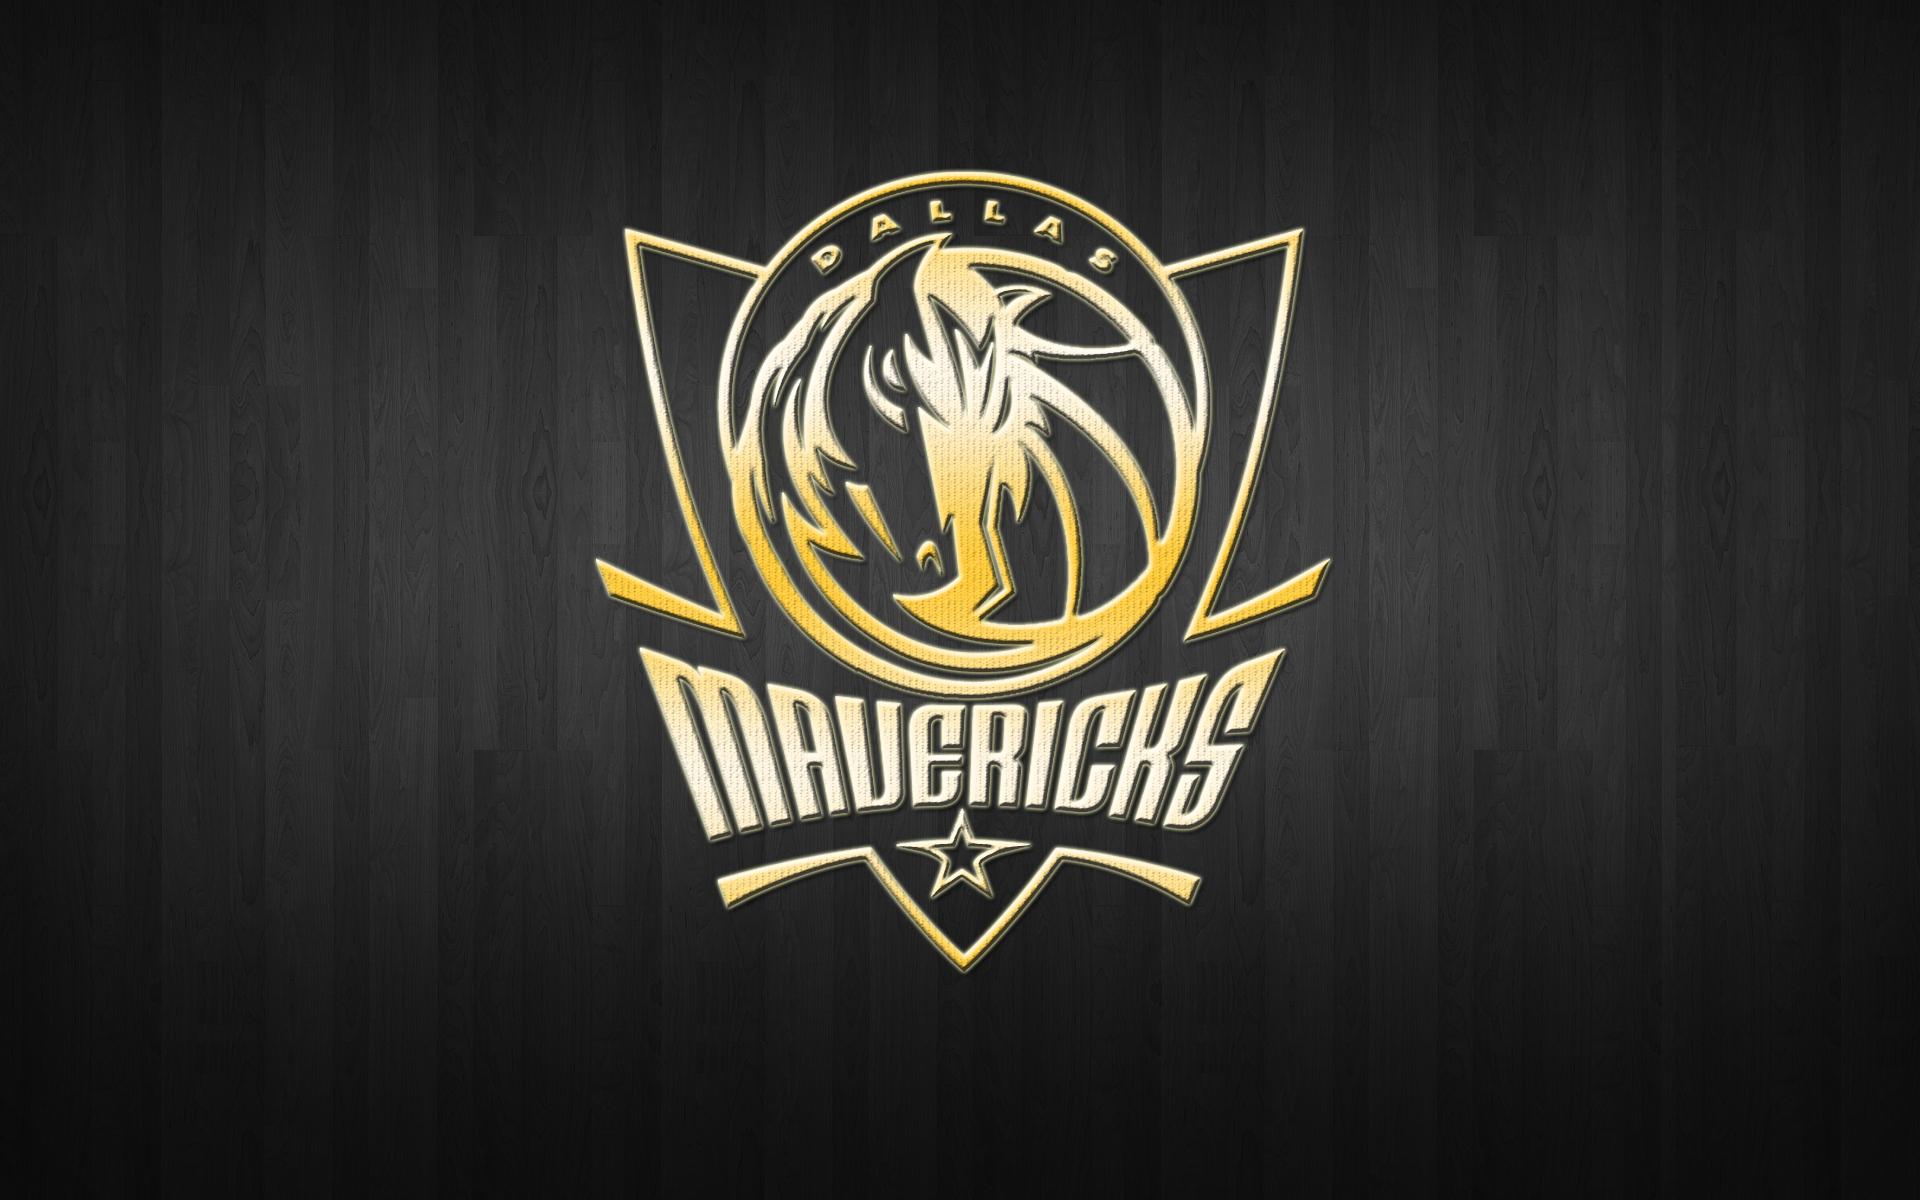 Dallas Mavericks Logo 3D wallpapers HD